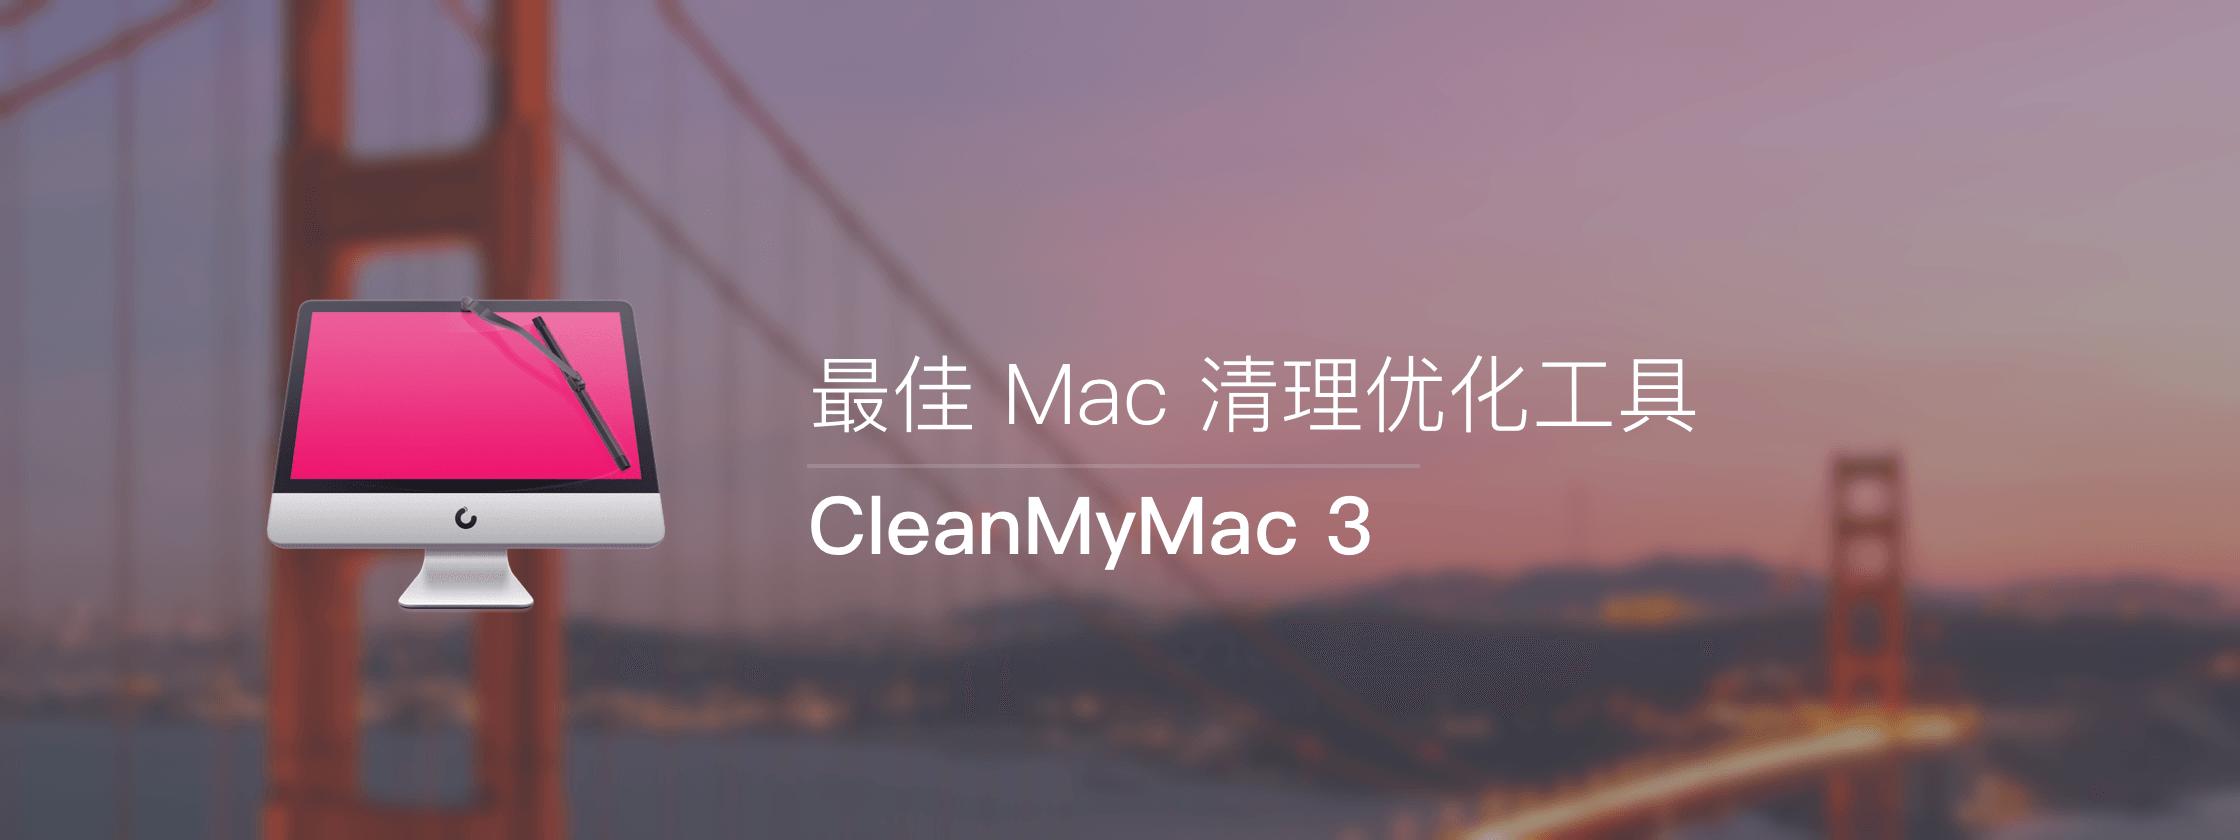 CleanMyMac 3 – 最佳 Mac 清理优化工具